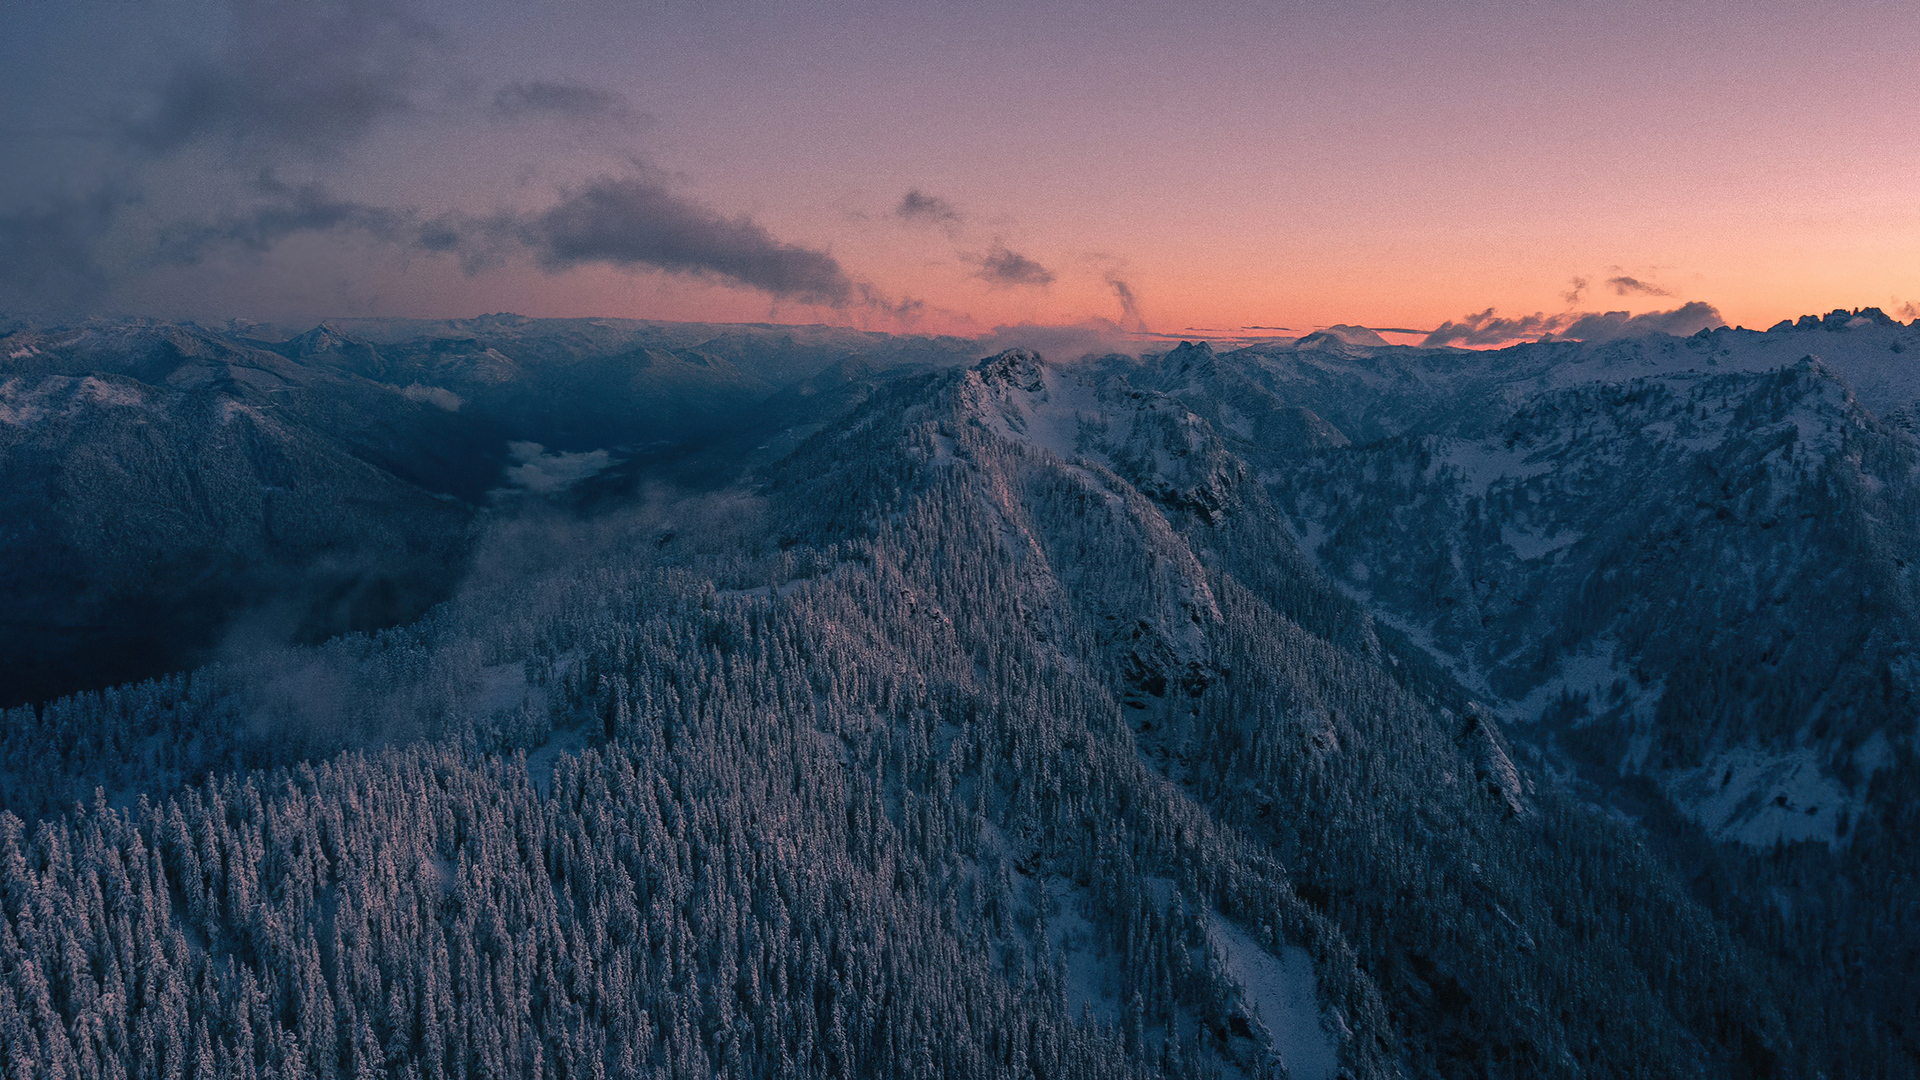 snow-mountains-landscape-4k-q5.jpg